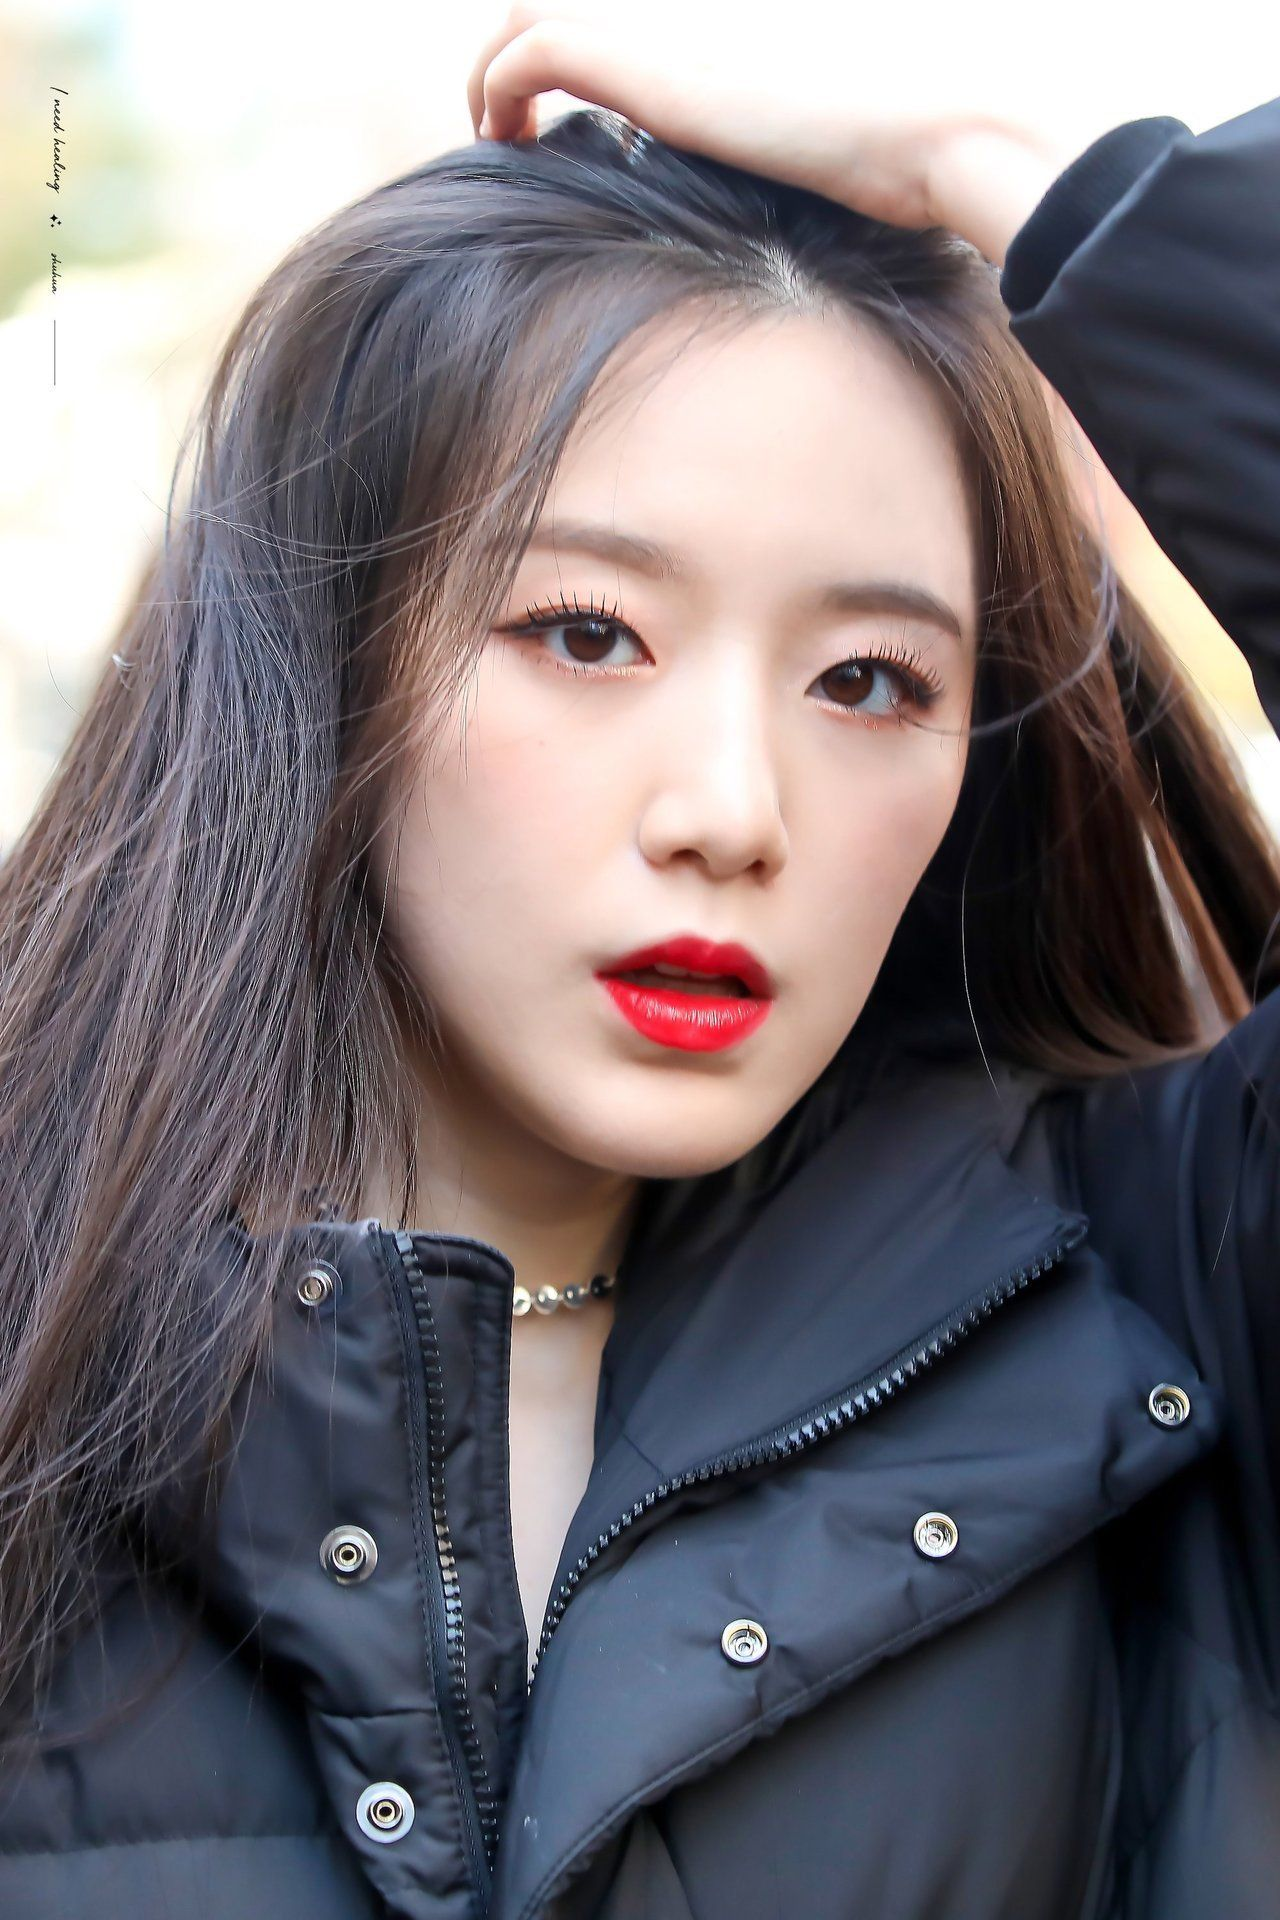 G Idle I Need Healing Do Not Edit The G Is Silent Kpop Girls Korean Beauty Kpop Girl Groups